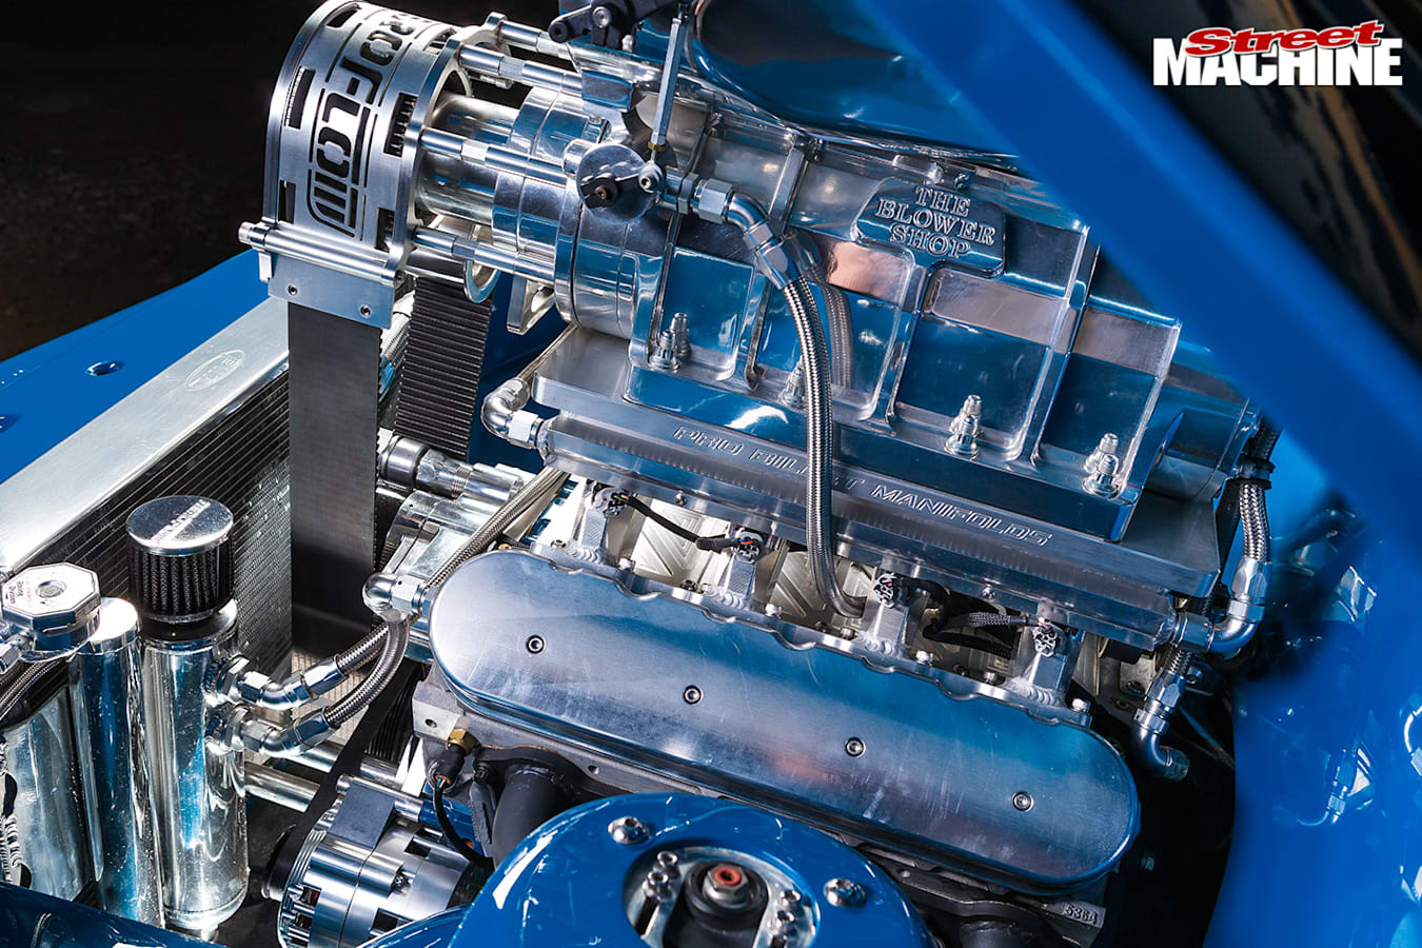 Holden VK Commodore engine